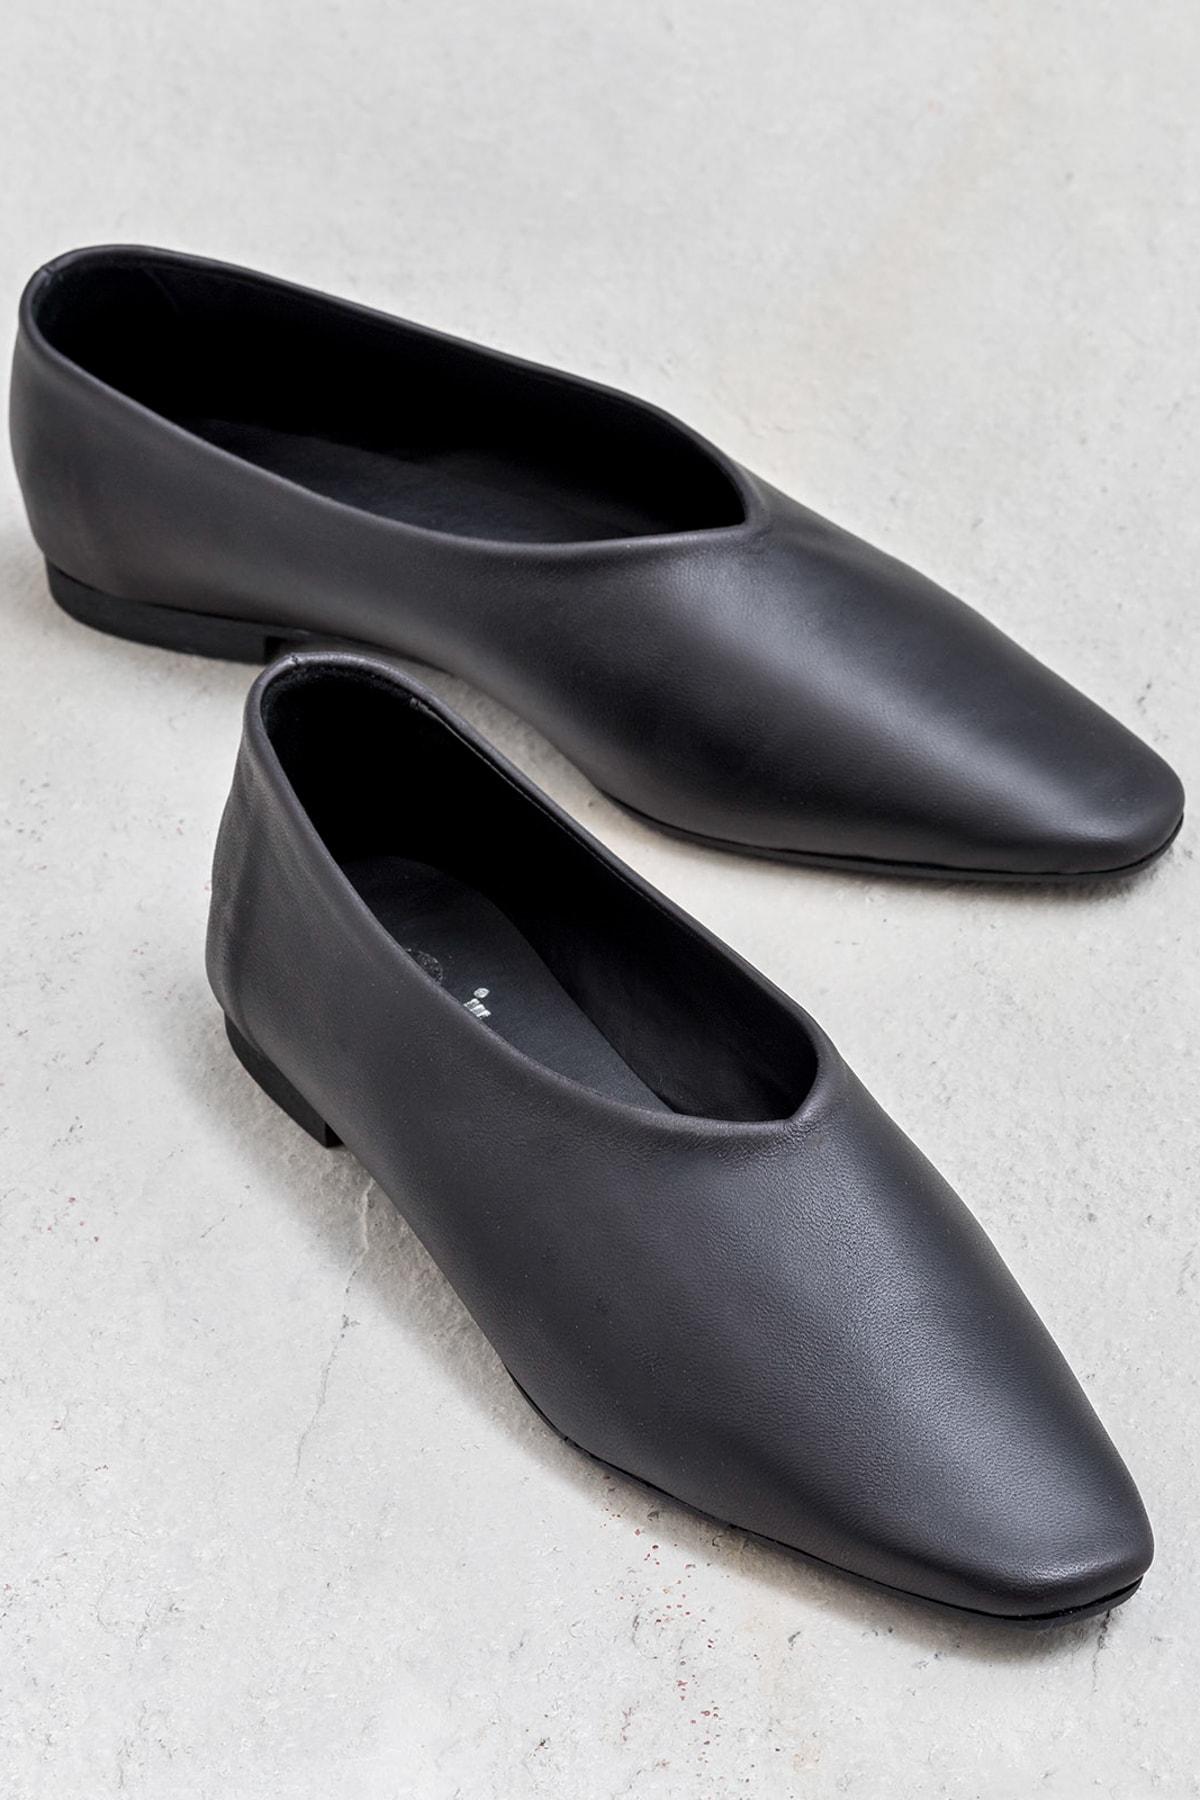 Elle Shoes Sallie Hakiki Deri Kadin Siyah Ayakkabi Trendyol